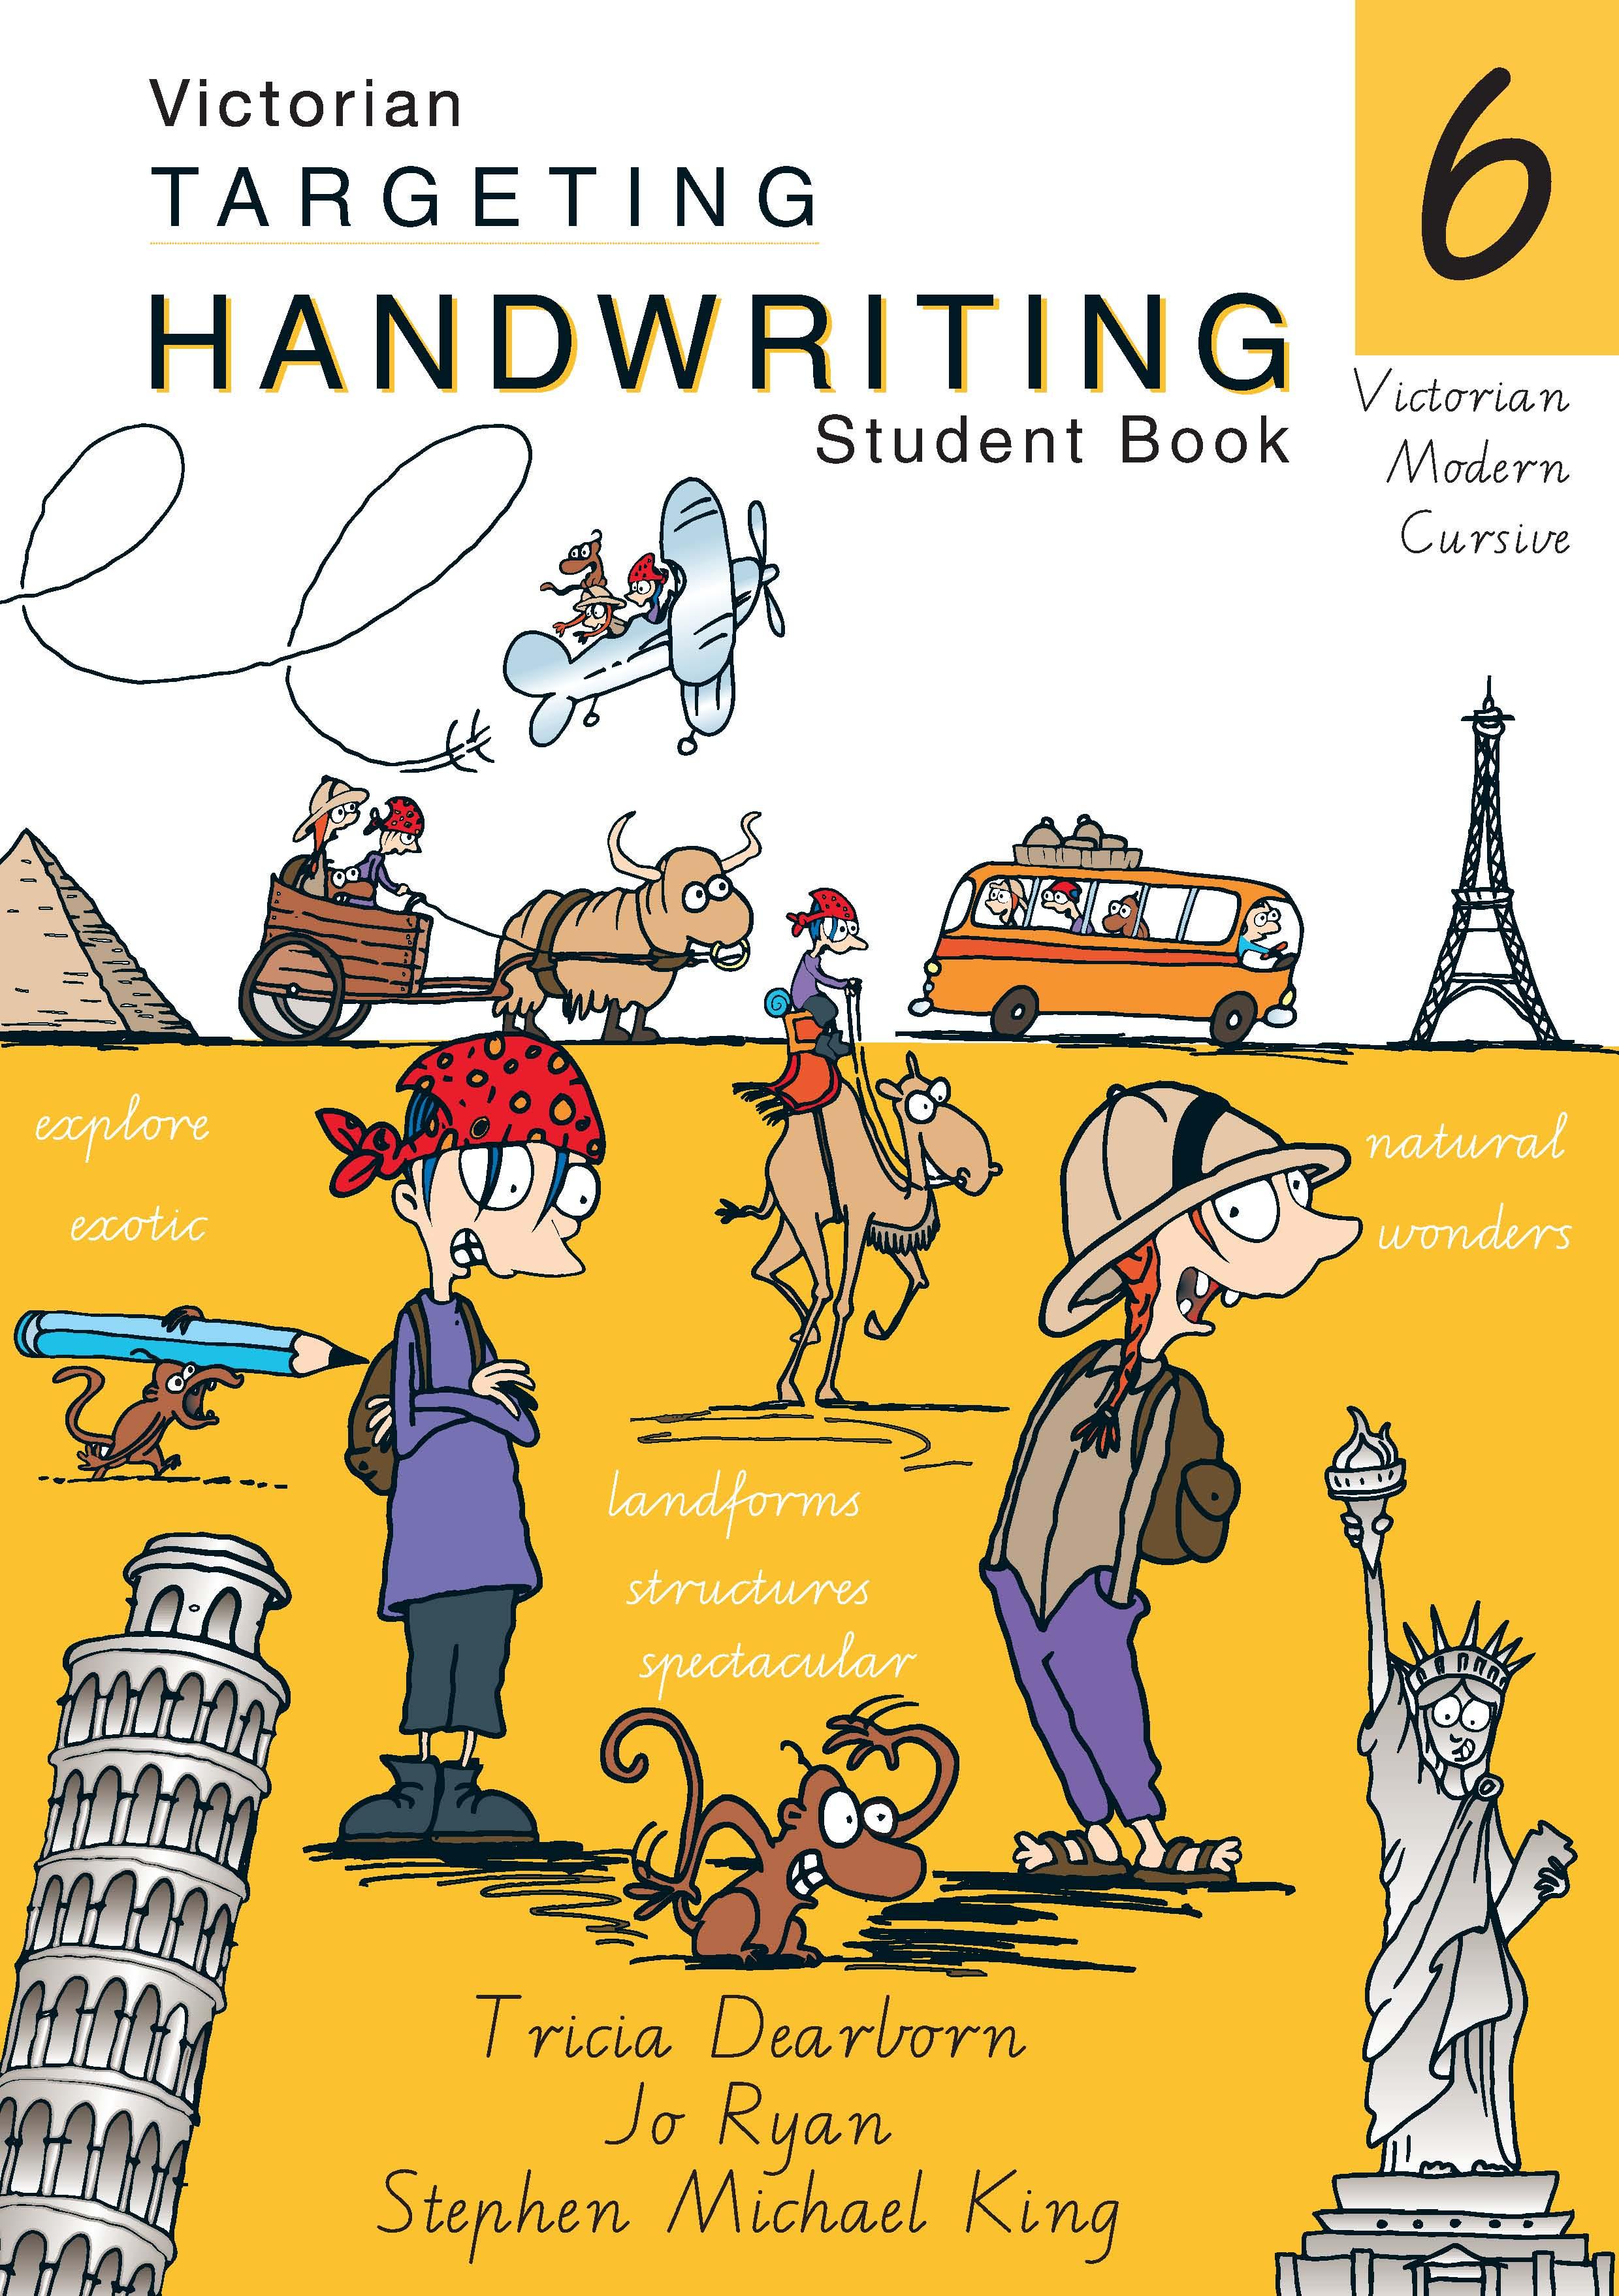 VIC Targeting Handwriting Student Book 6